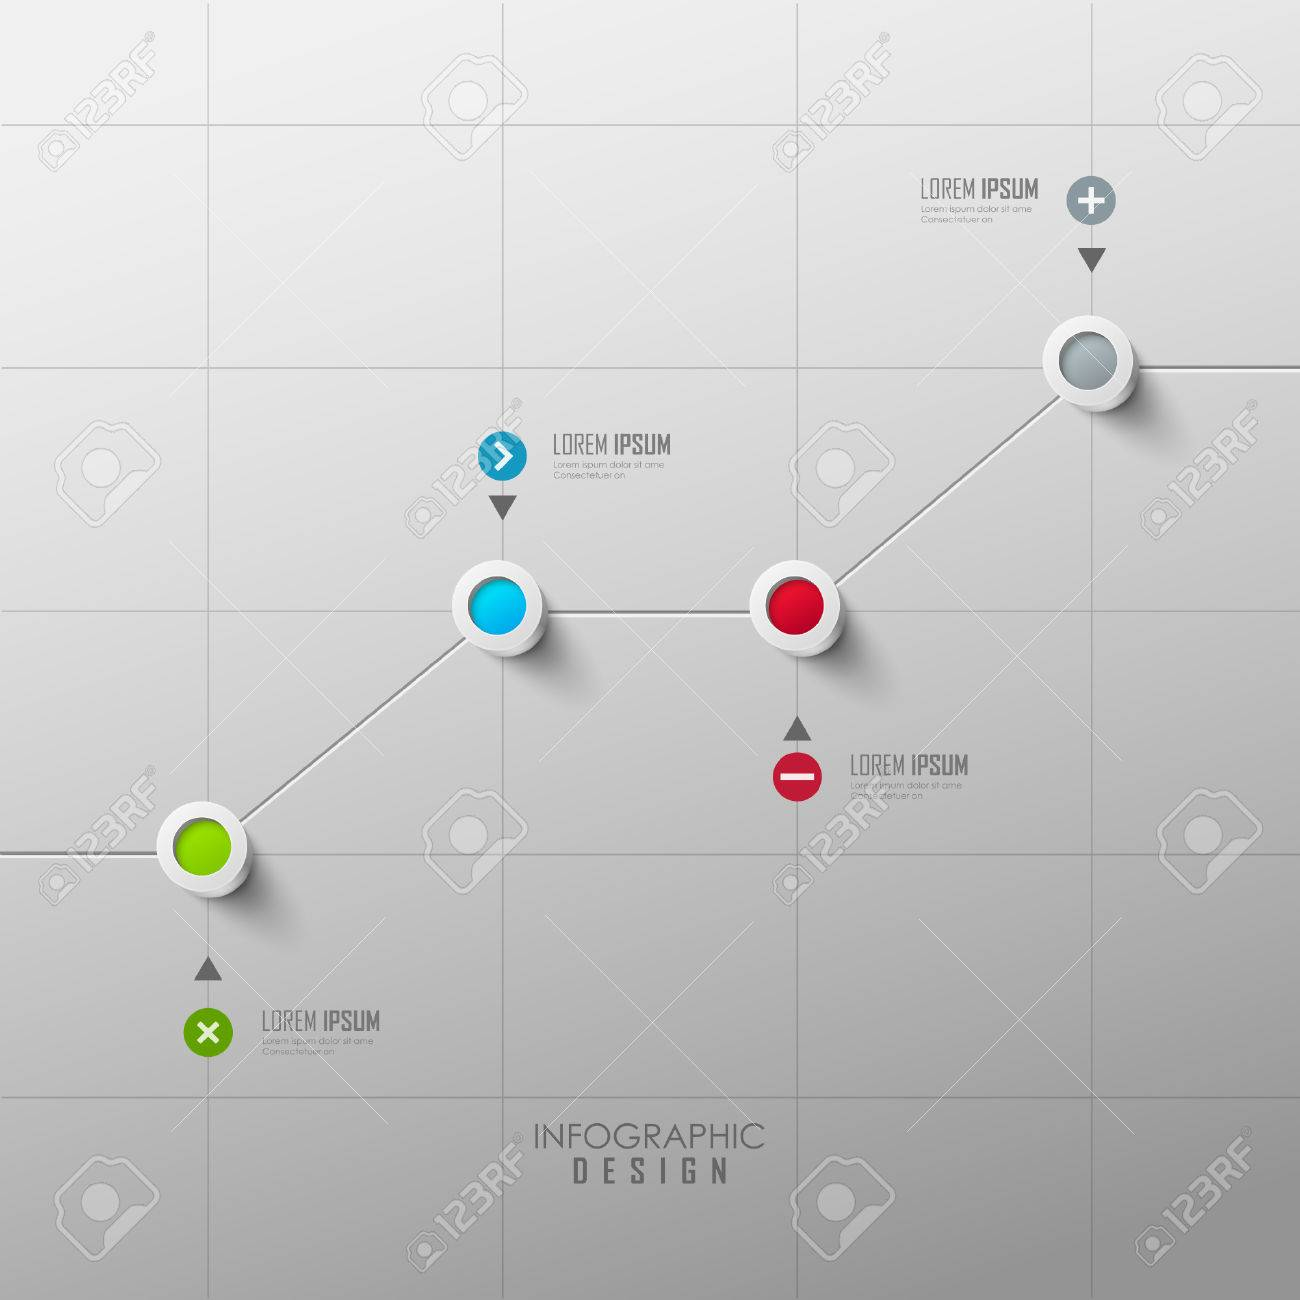 Vector infographic timeline design - 54603129